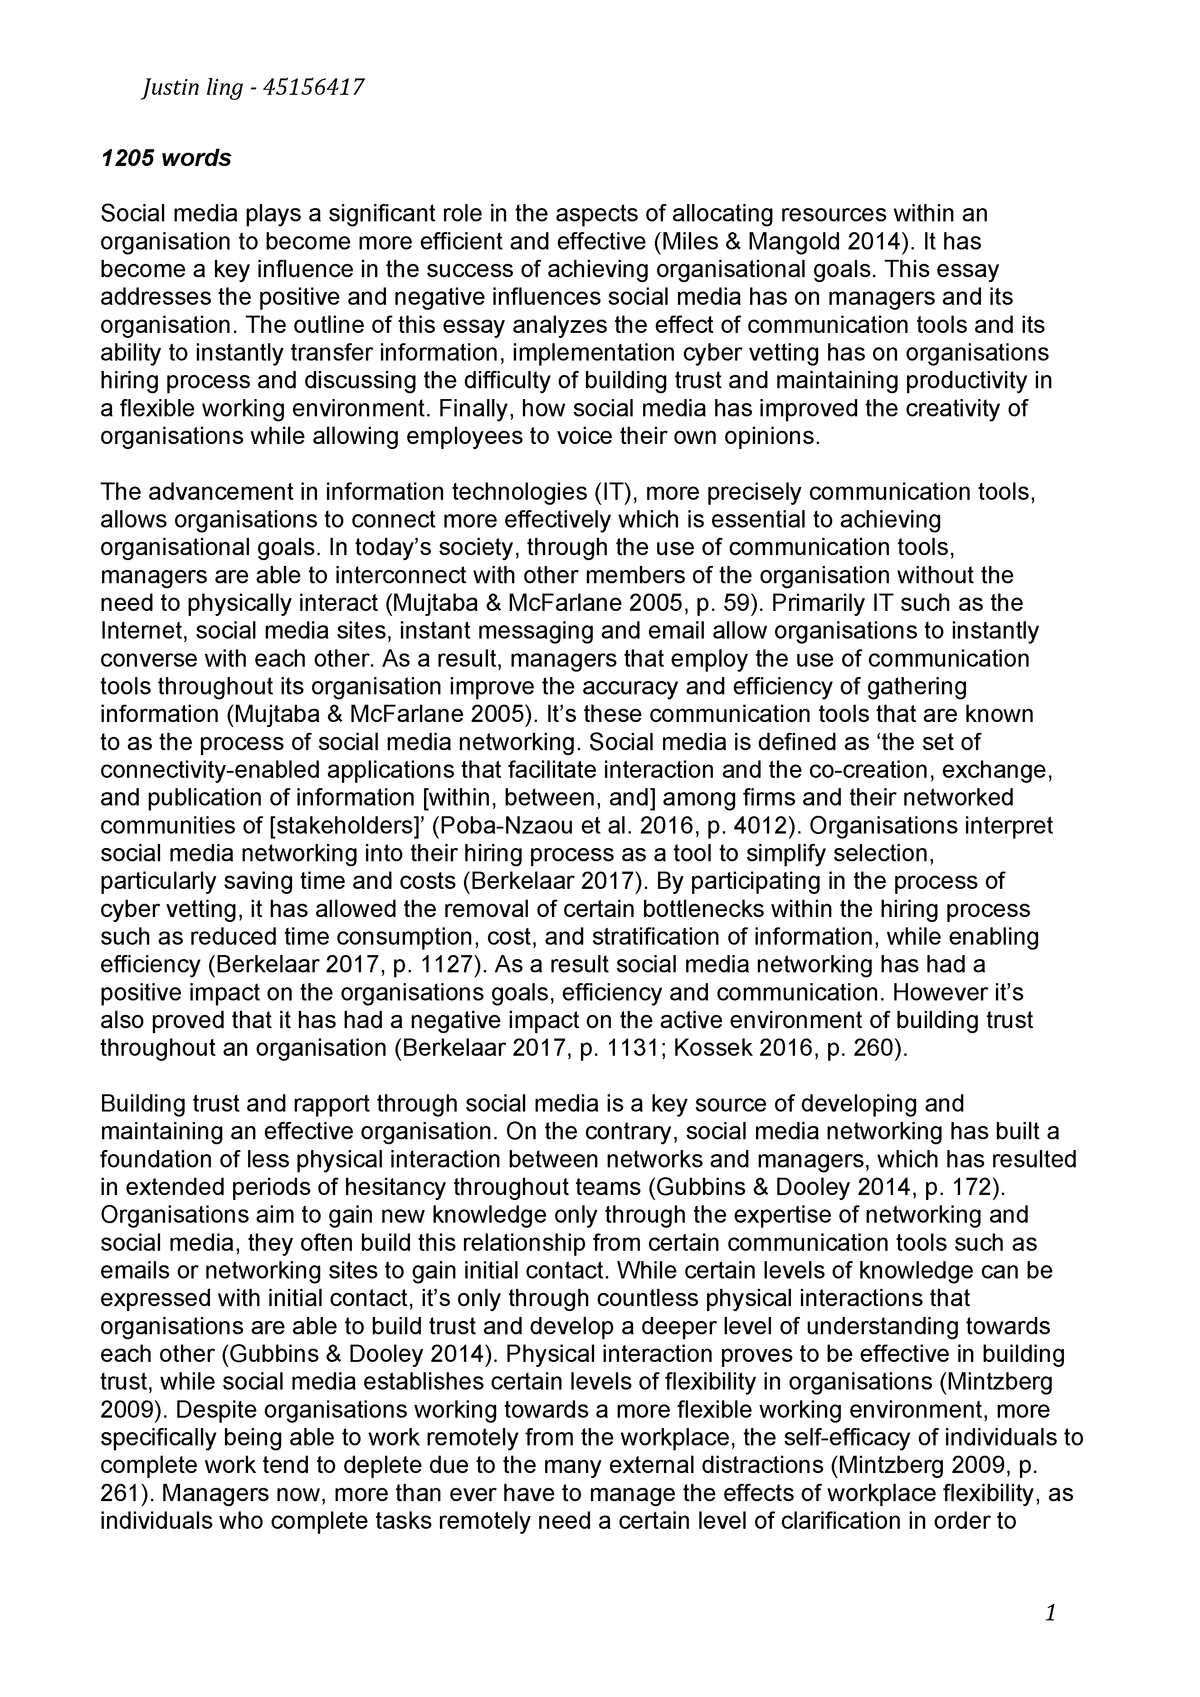 Essay on cyber law